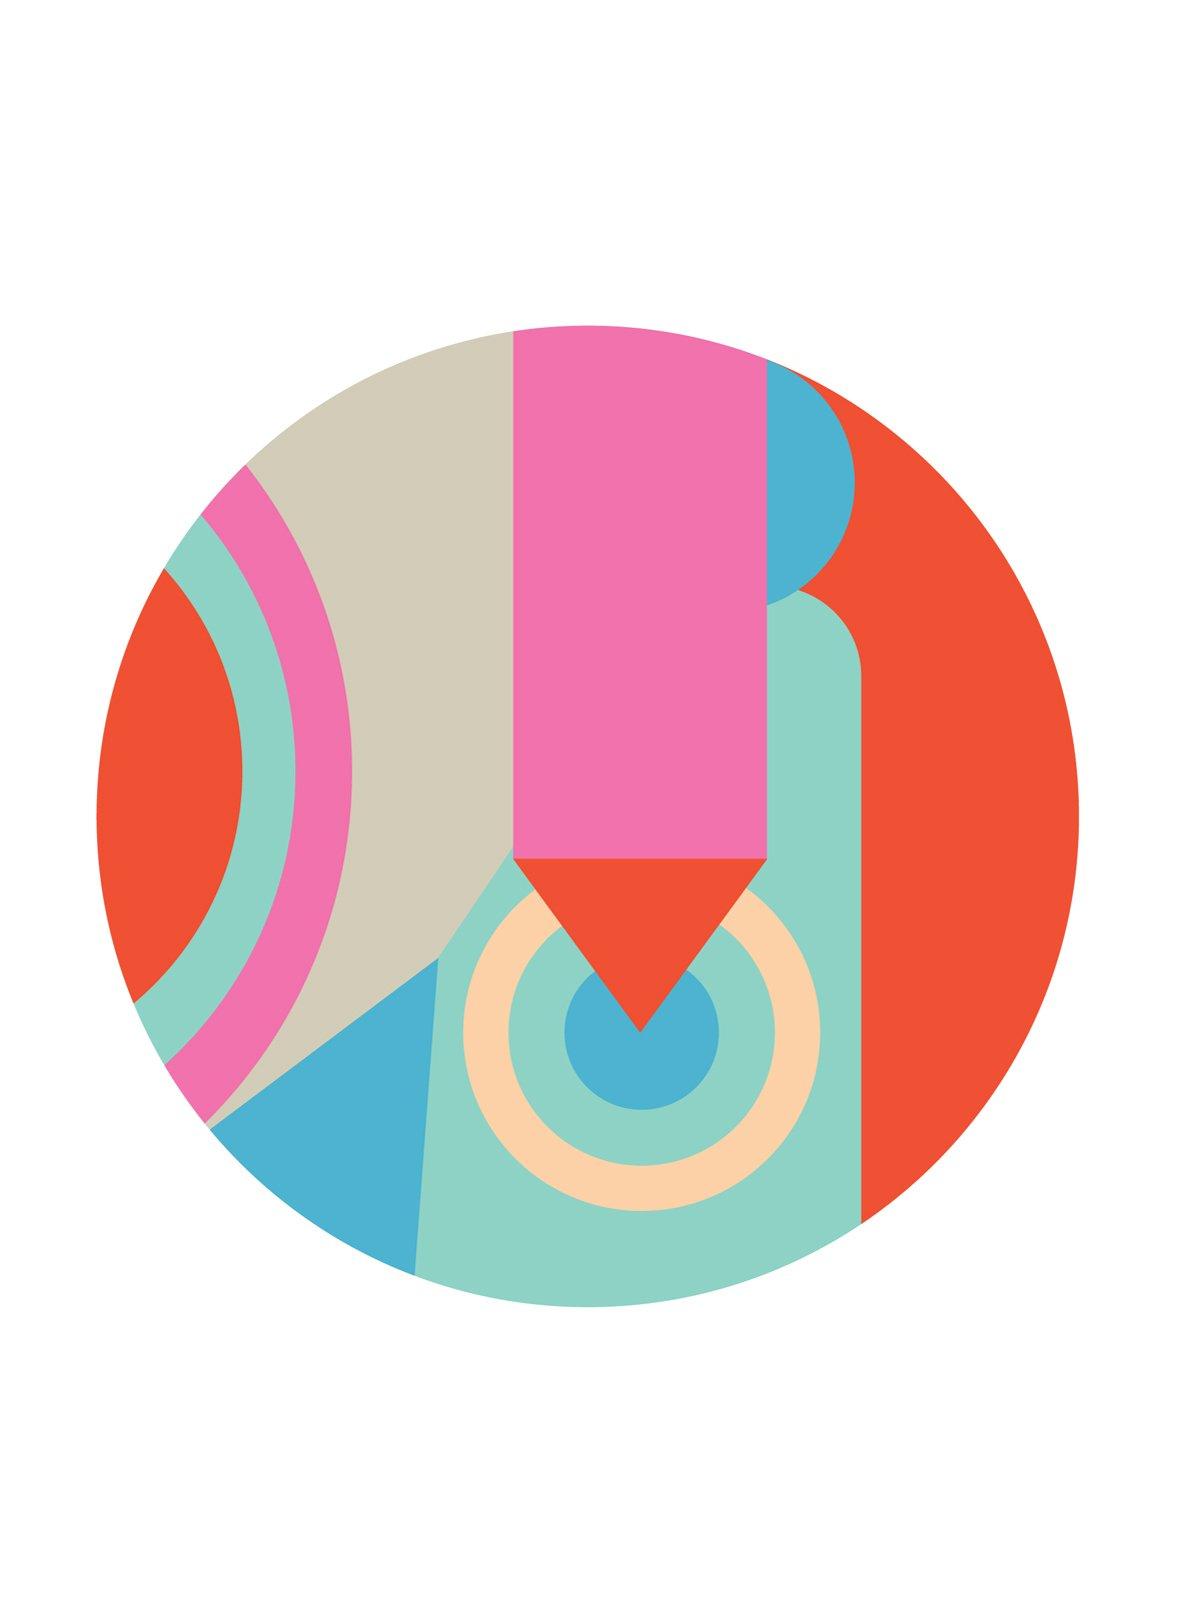 "Circle by Mike Perry.  Search ""강남풀싸롱+【OIO♬2I4I♧536I】강남야구장+강남룸+강남미러룸+강남하드코어+강남룸쌀롱+강남룸+강남풀싸롱+강남풀쌀롱+강남룸싸롱+강남하드코어"" from Illustrator Mike Perry"